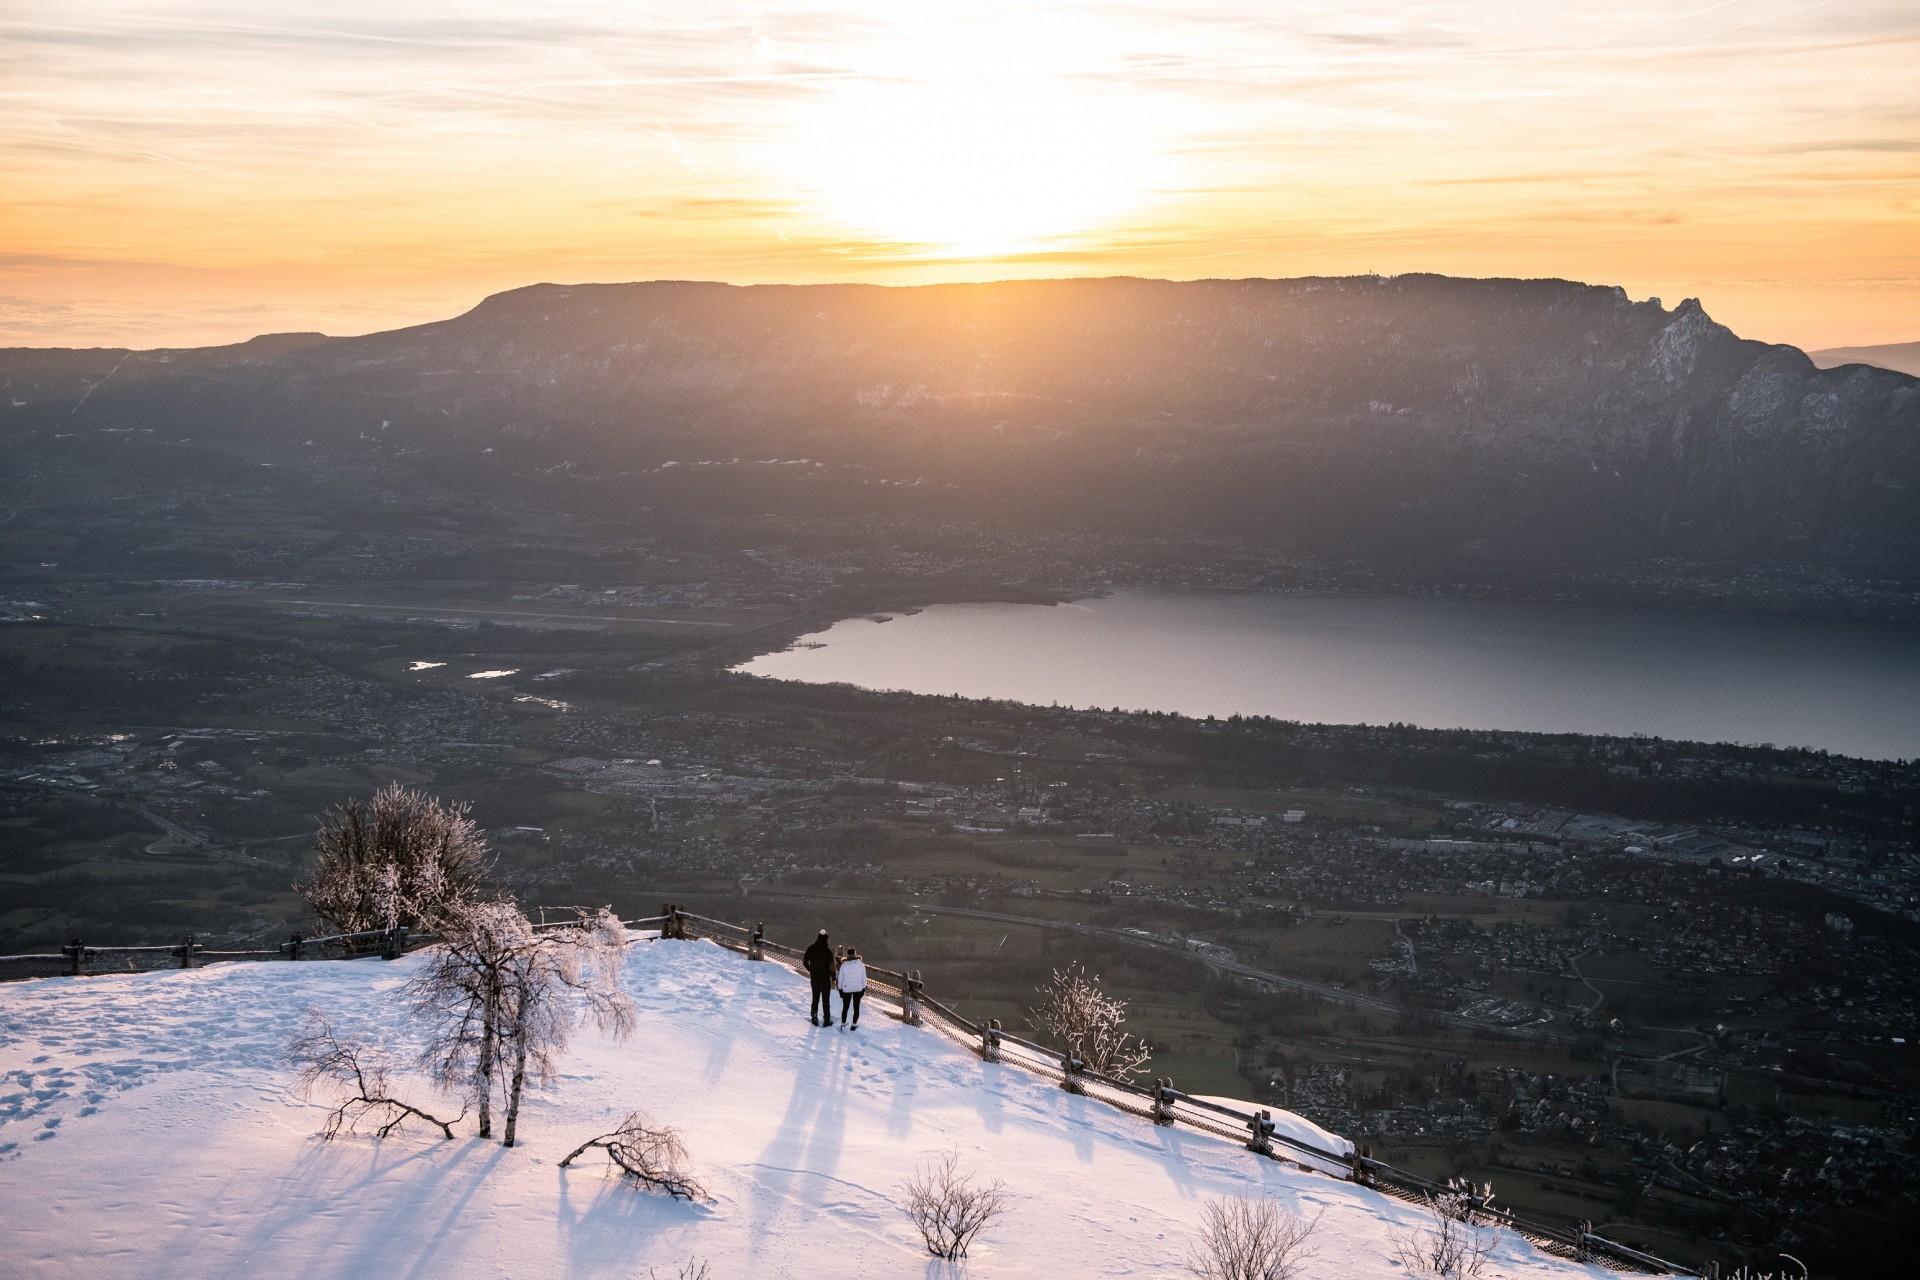 savoie-grand-revard-hiver-2019-peignee-verticale-441